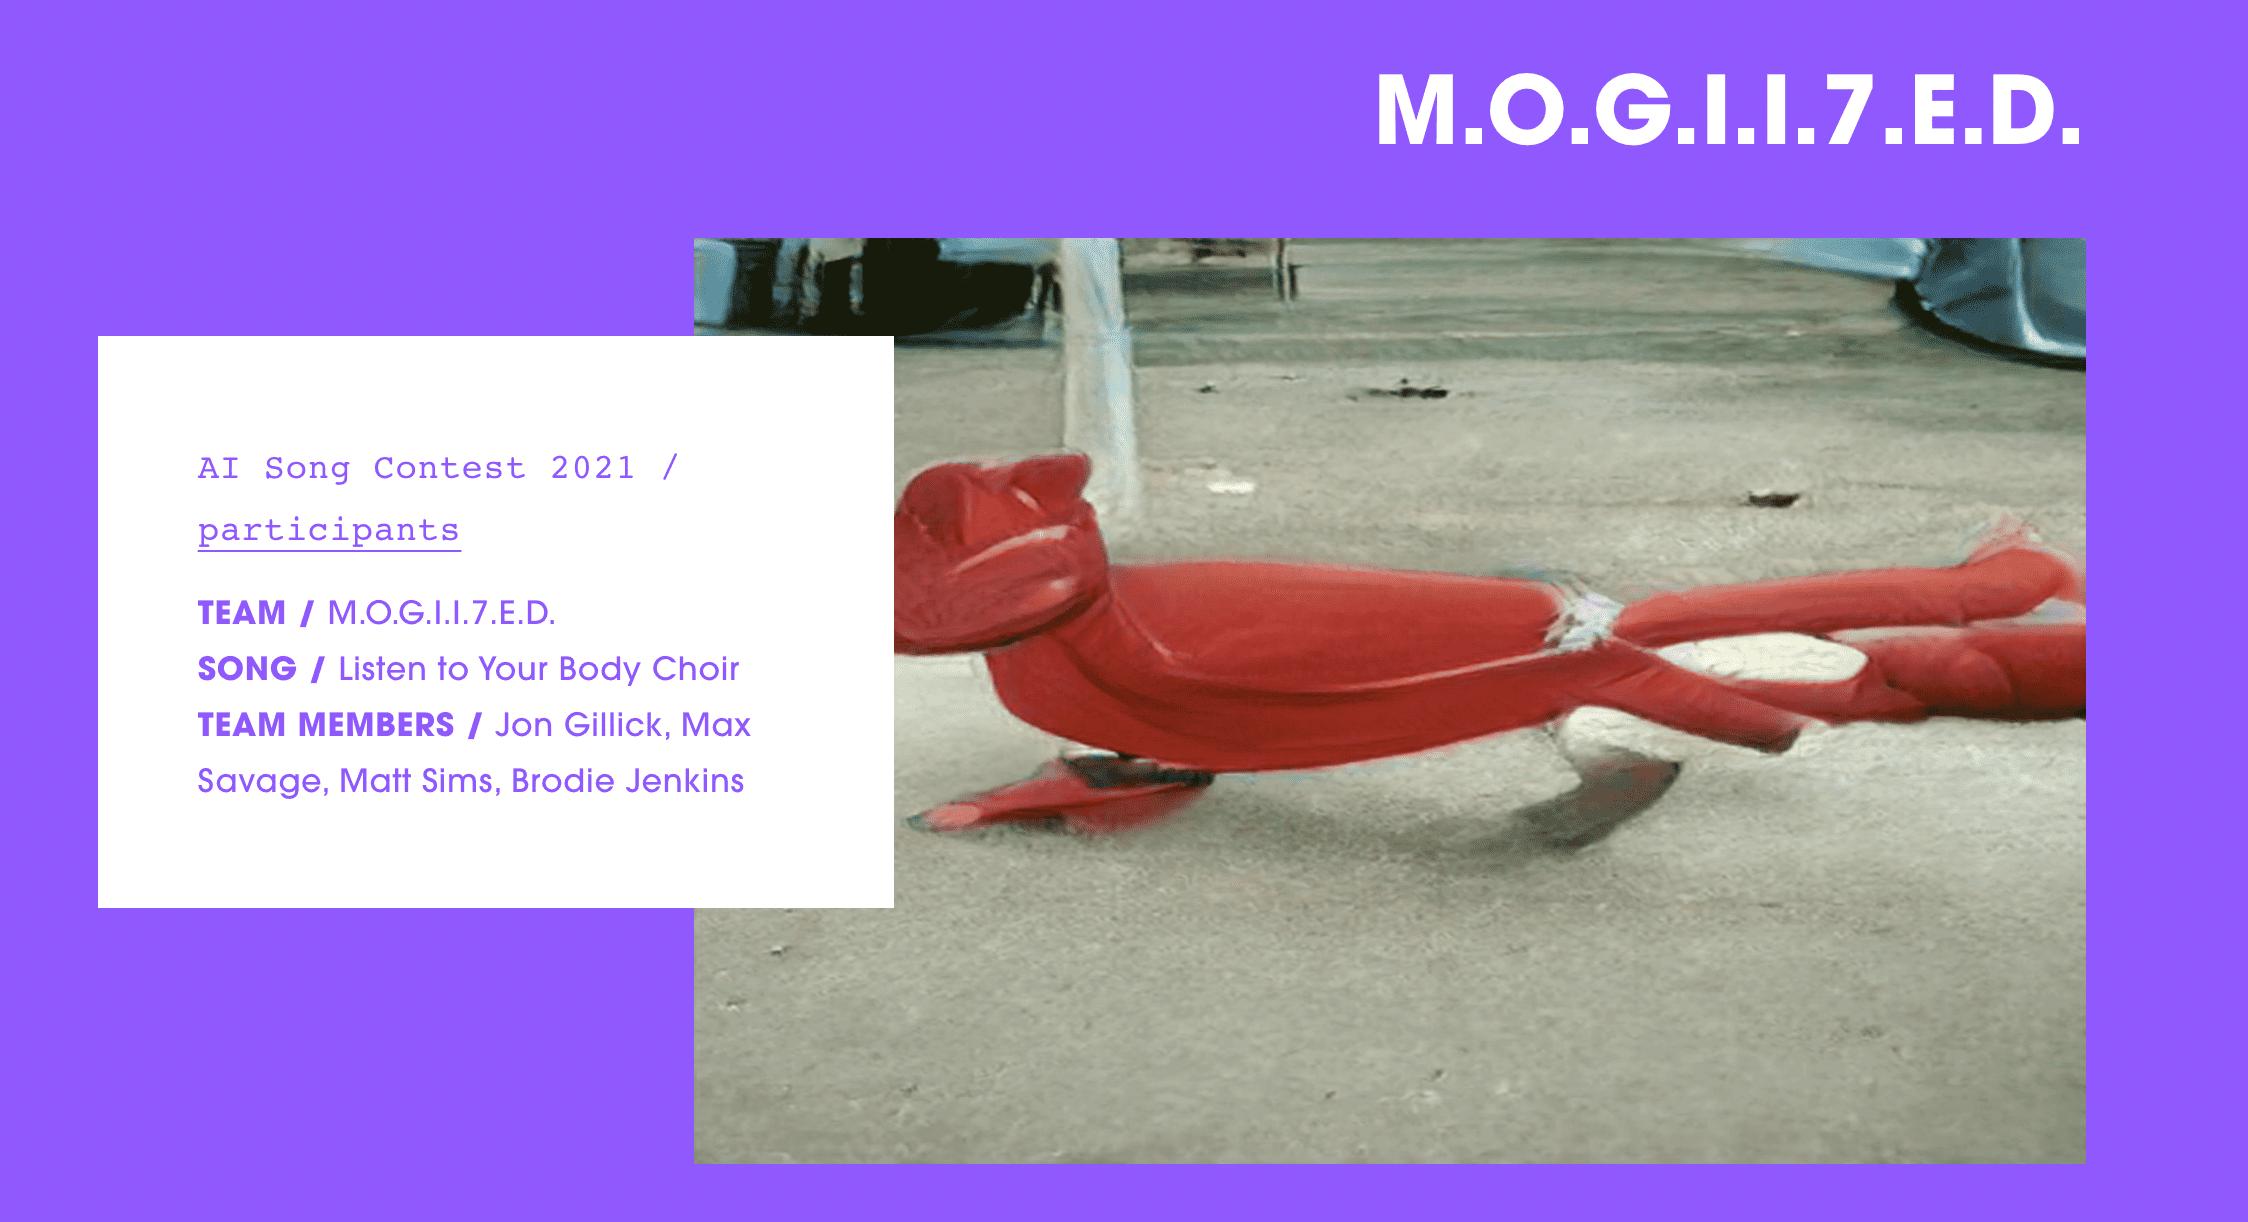 M.O.G.I.I.7.E.D., the winners of the 2021 AI song contest